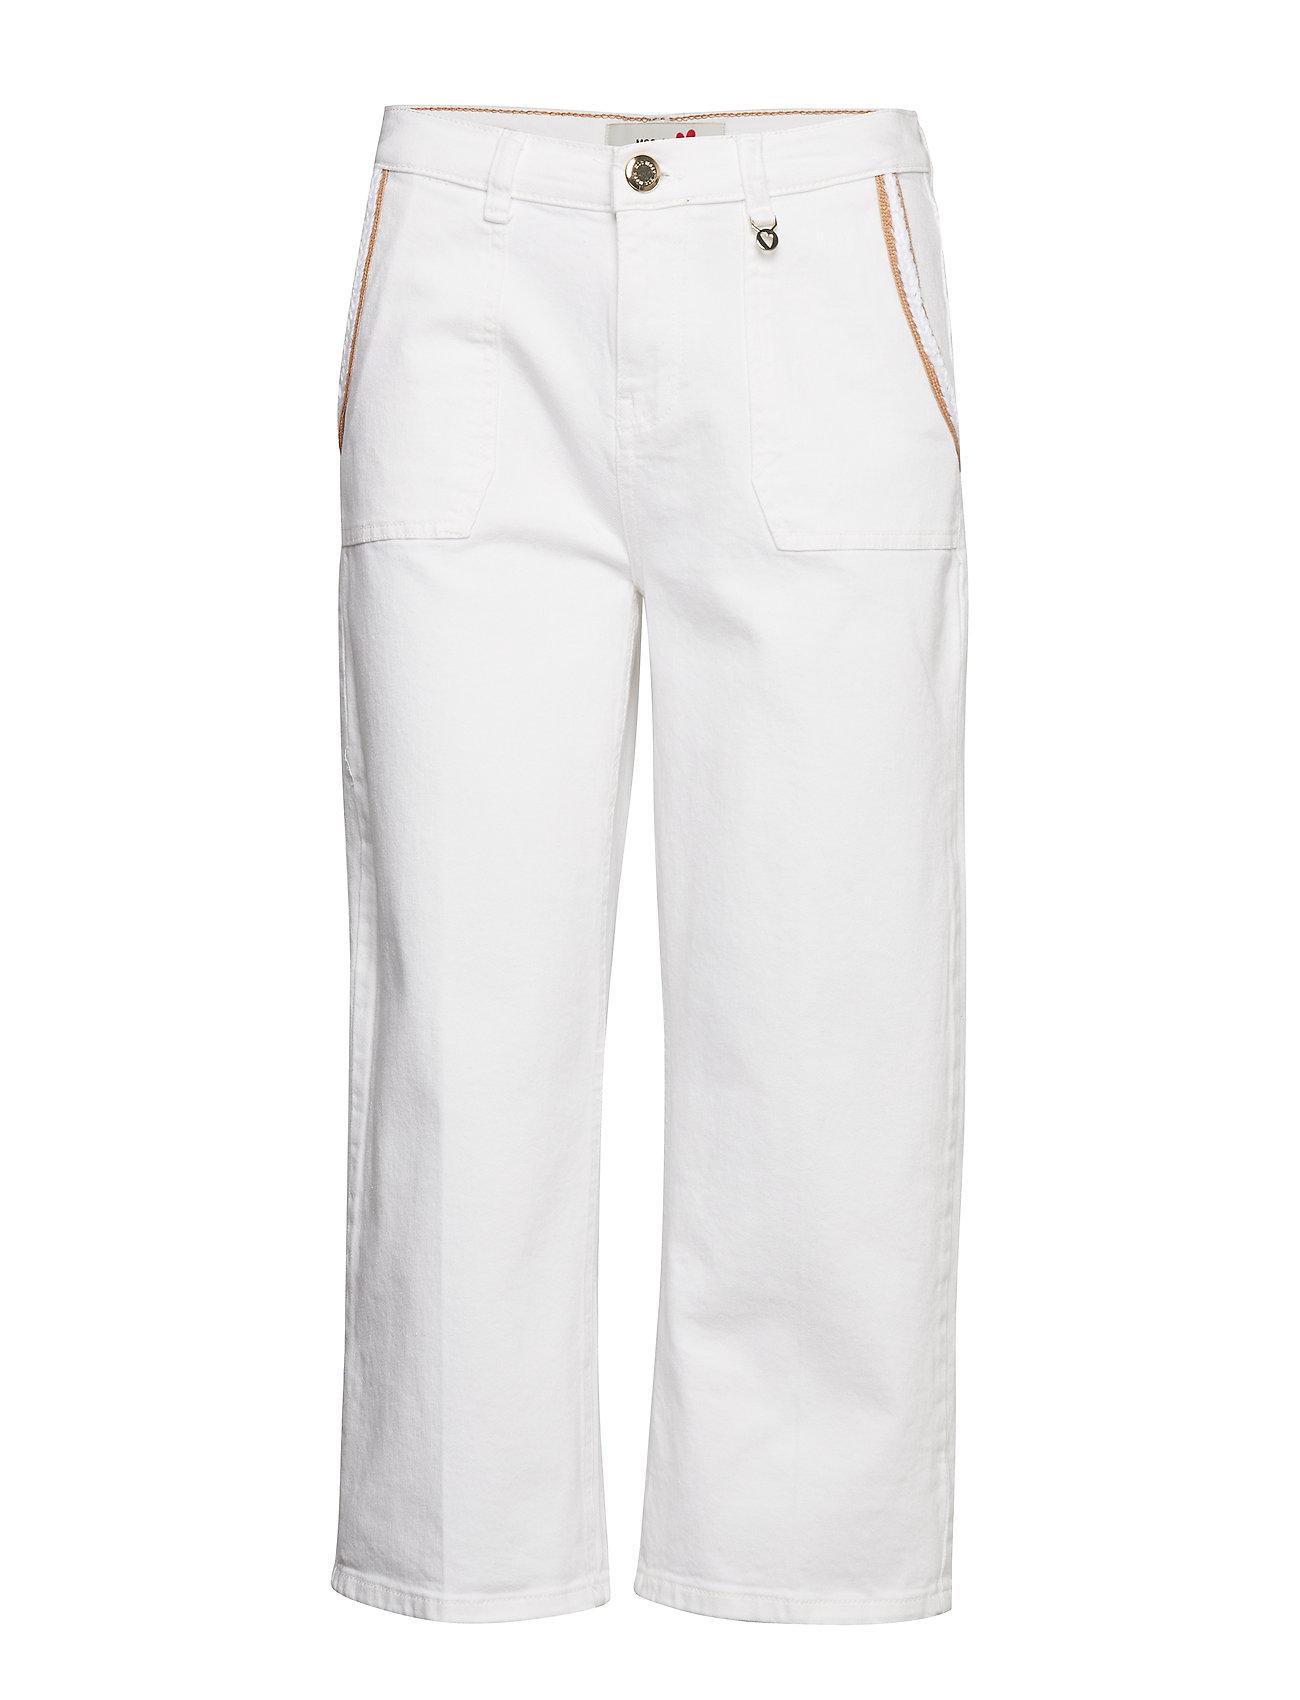 MOS MOSH Cora Culotte Jeans